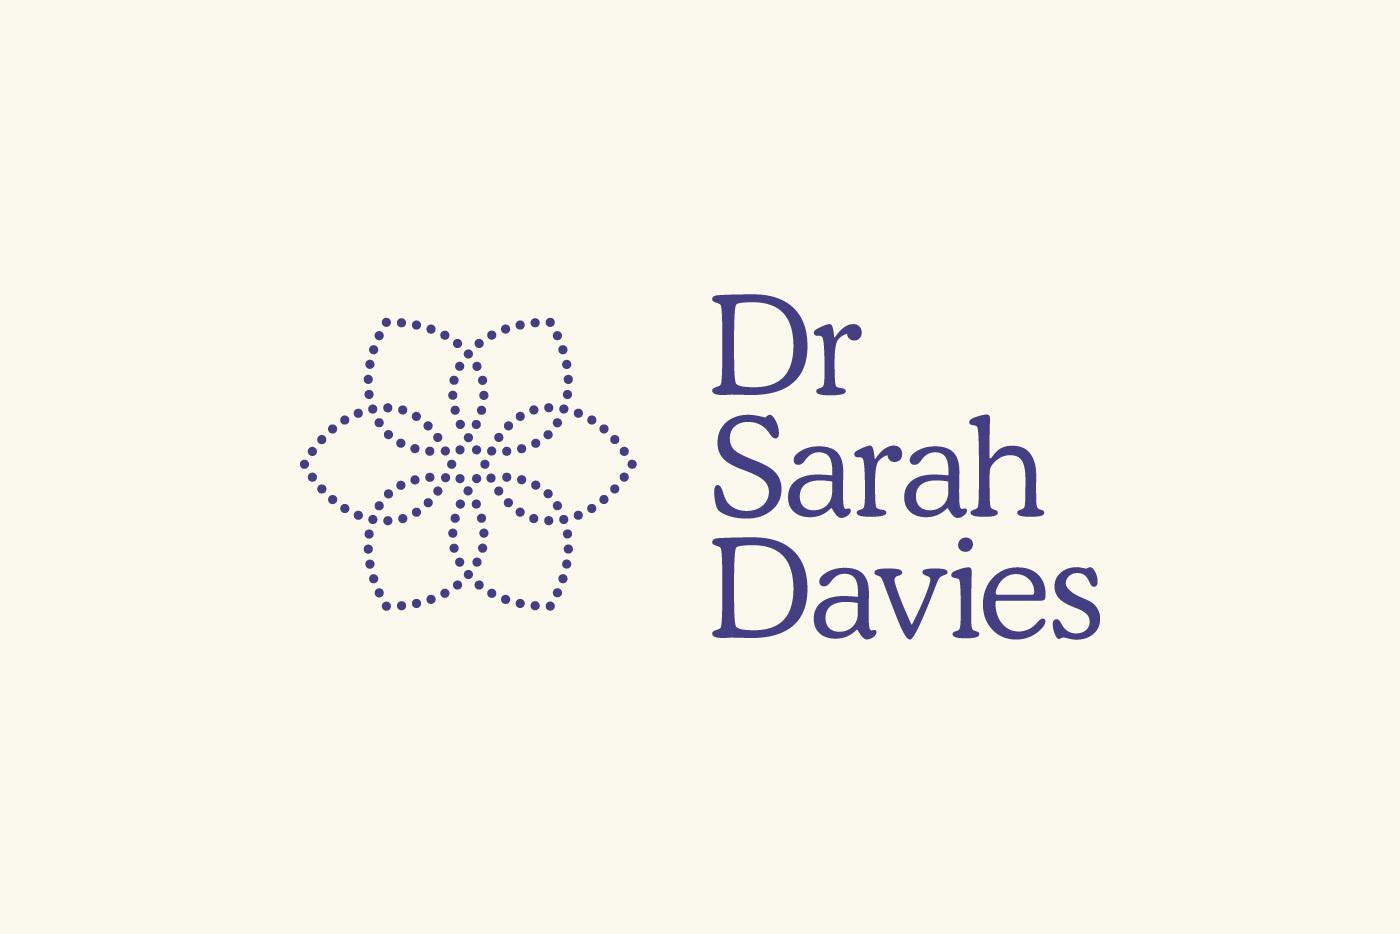 Dr Sarah Davies Branding Logo Identity